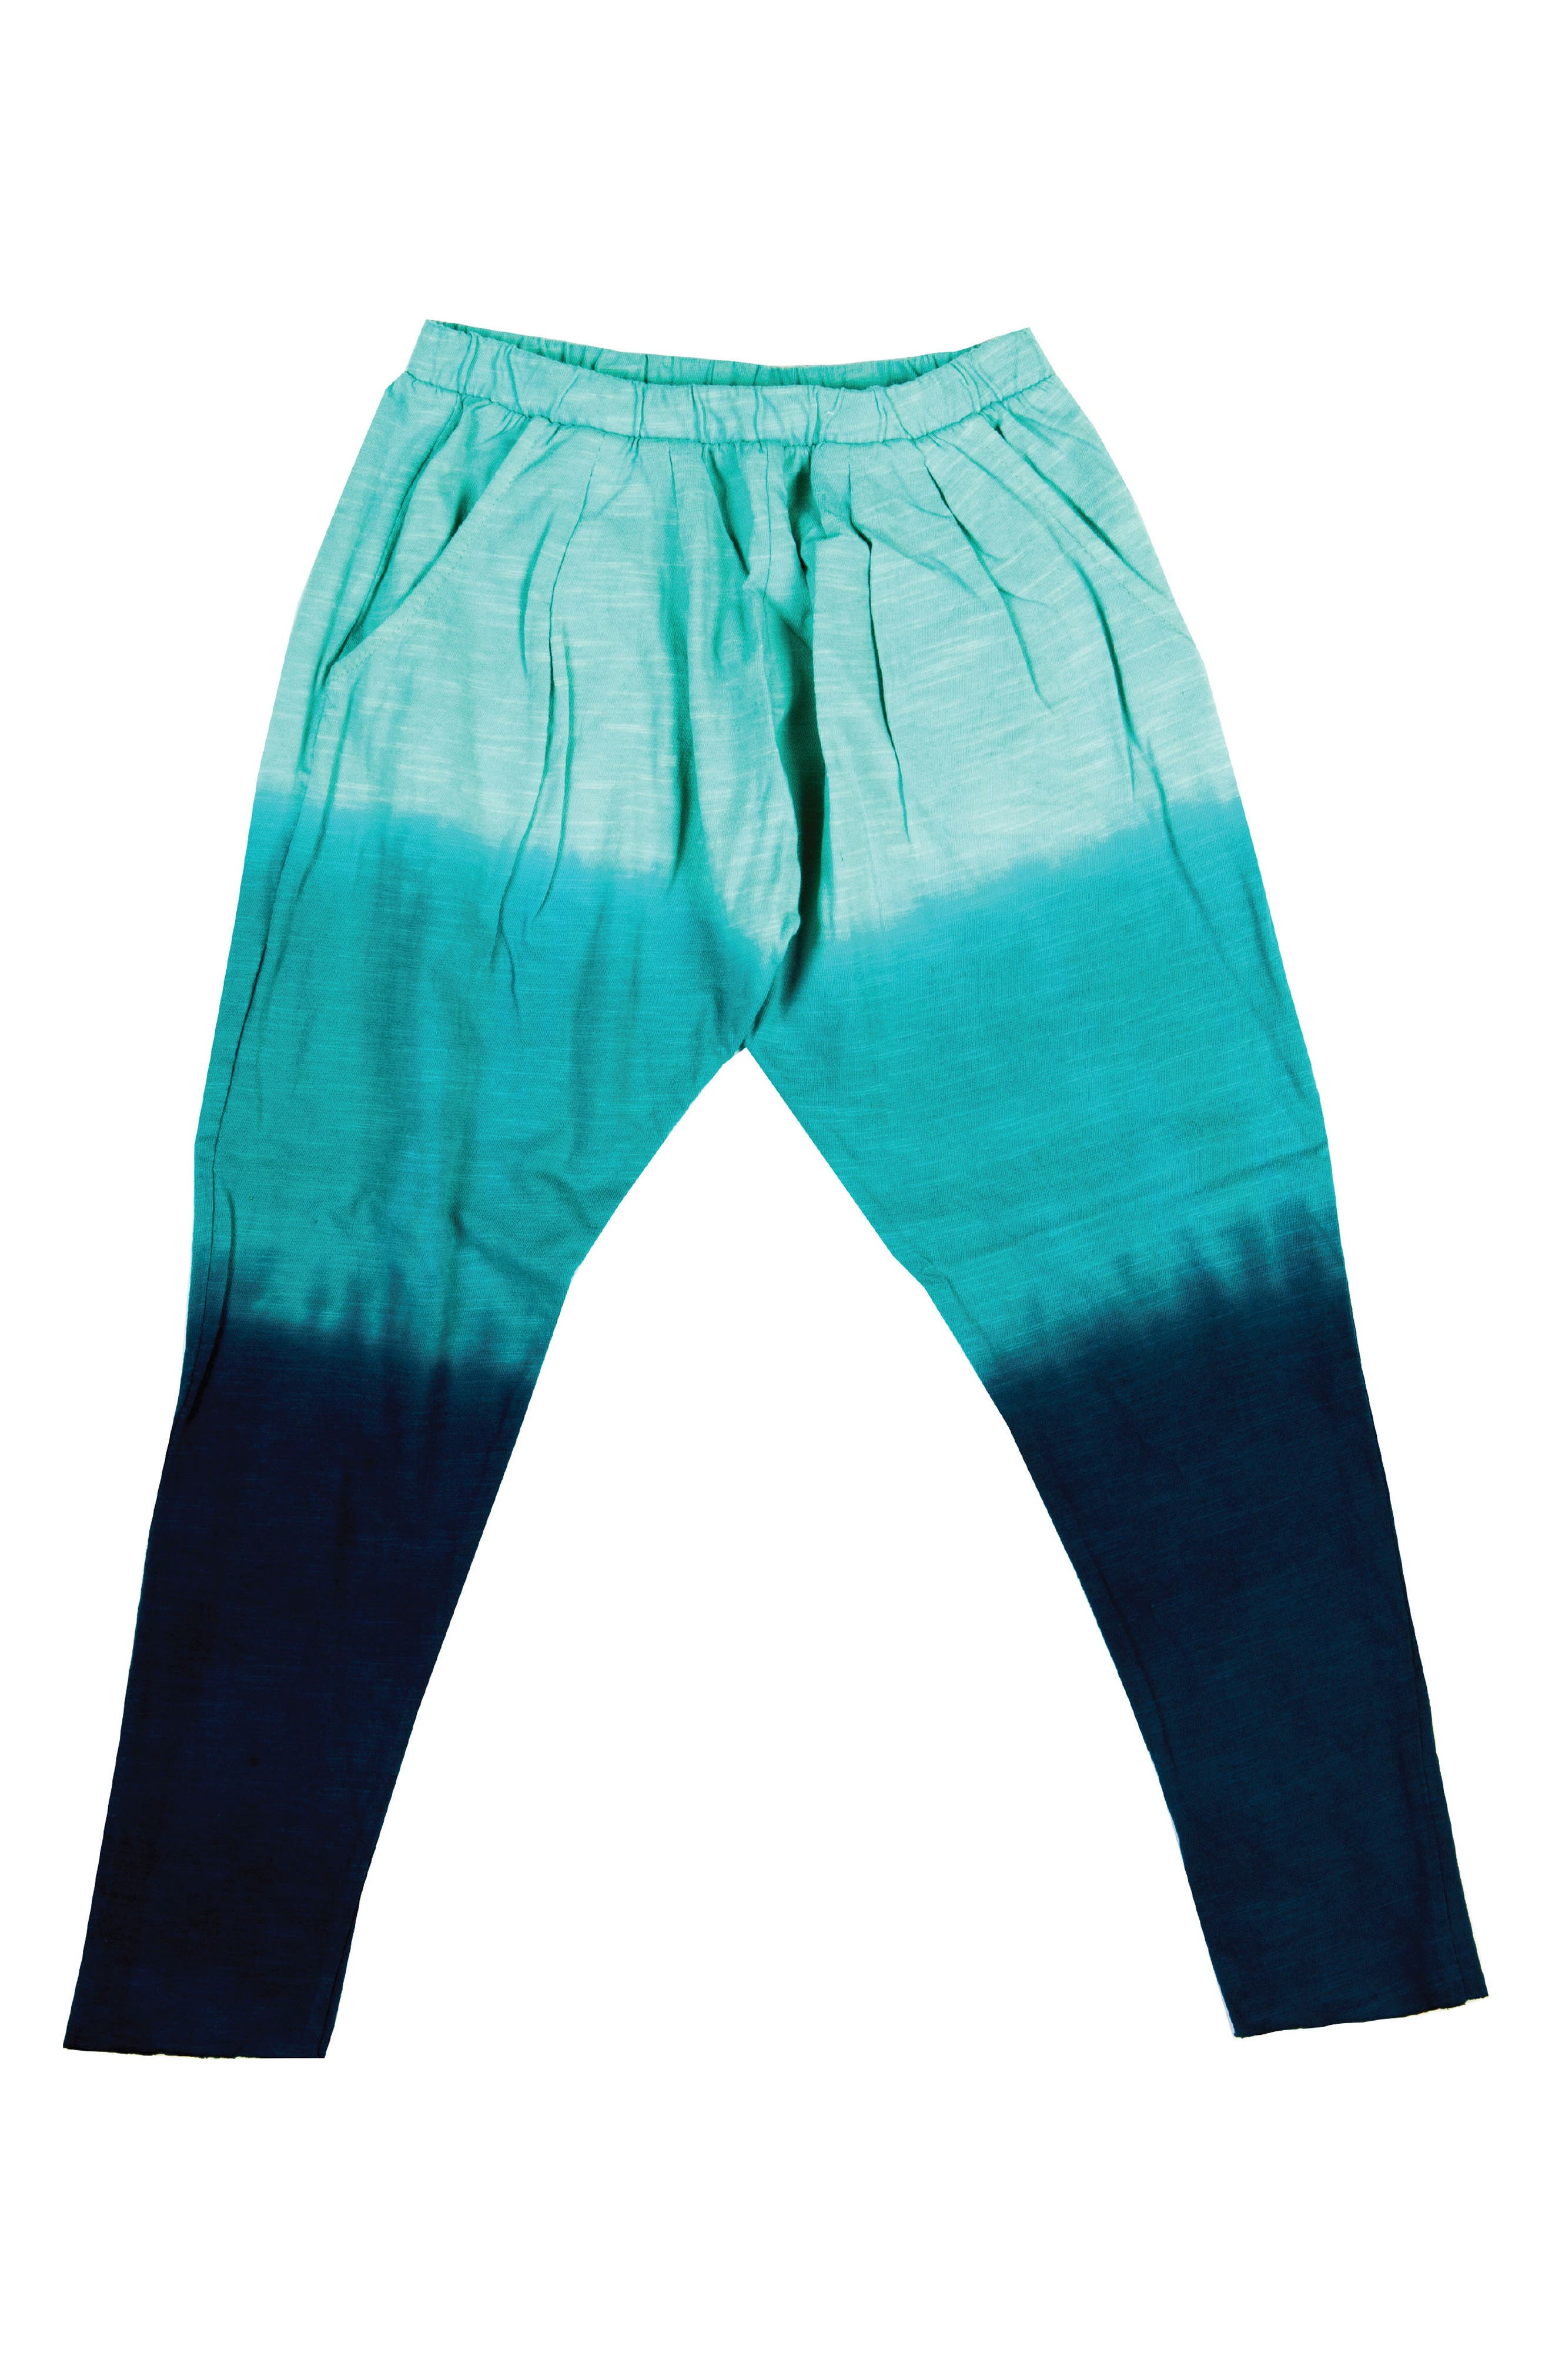 BOWIE X JAMES Dip Dye Harem Pants (Toddler Girls, Little Girls & Big Girls)